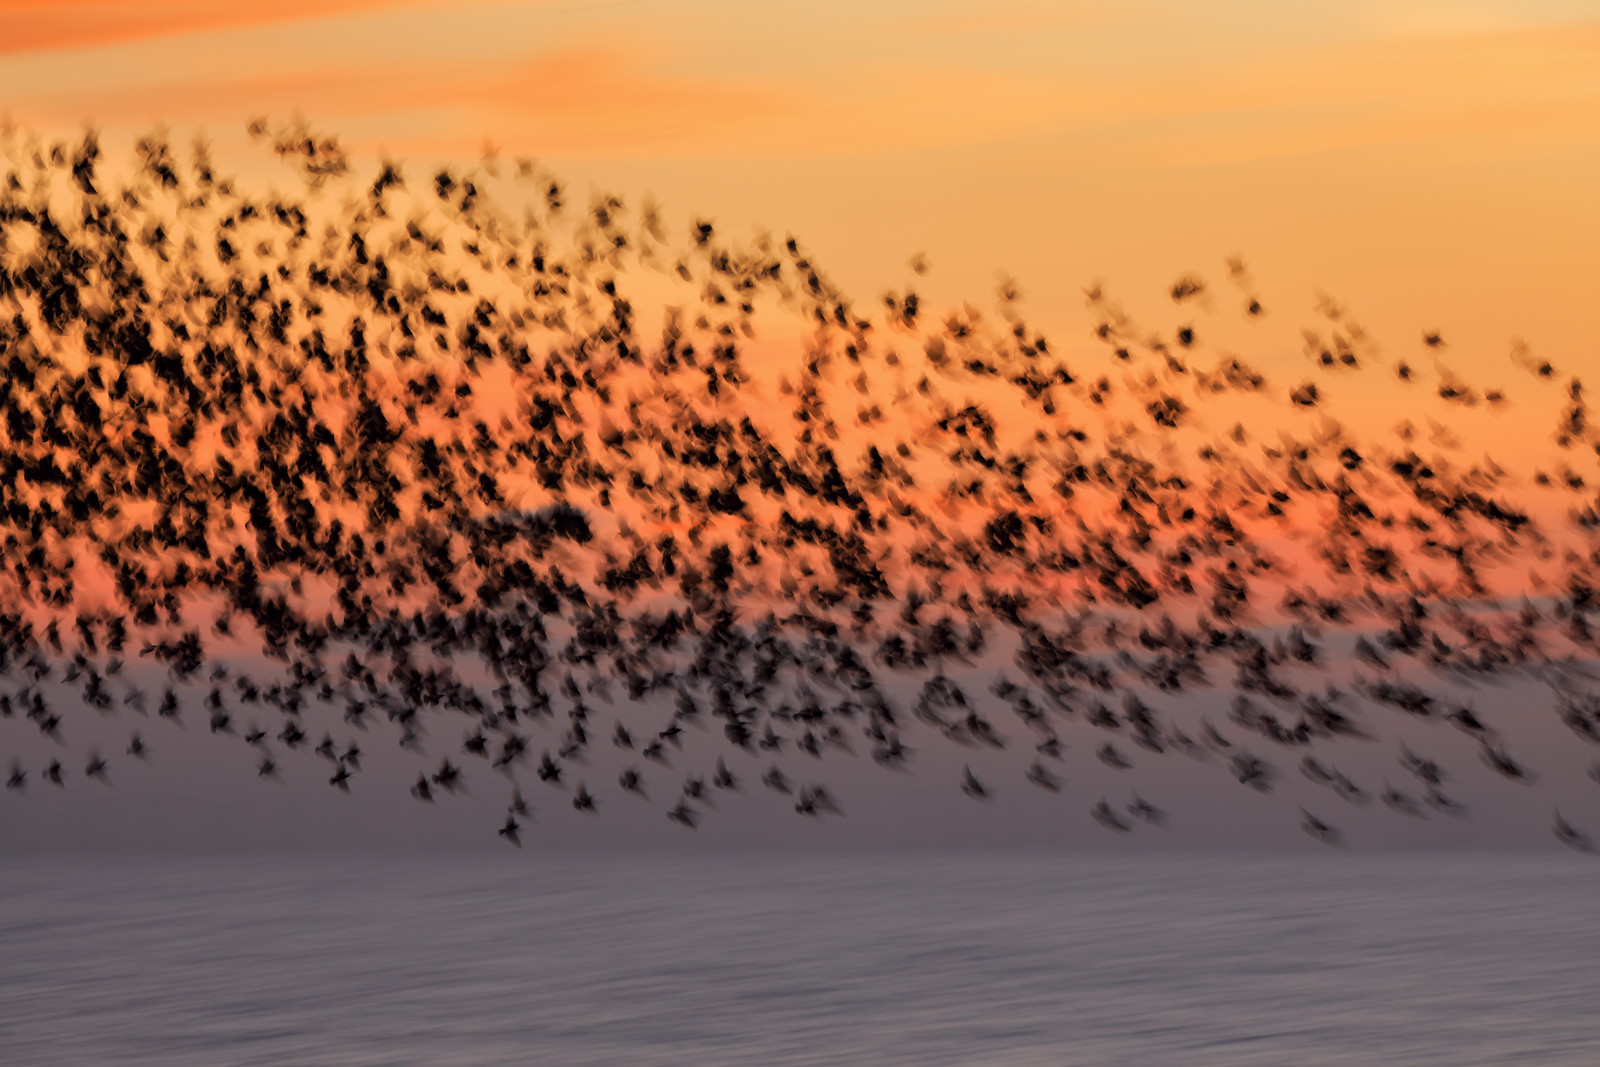 Starling Blurmuration at Sunset